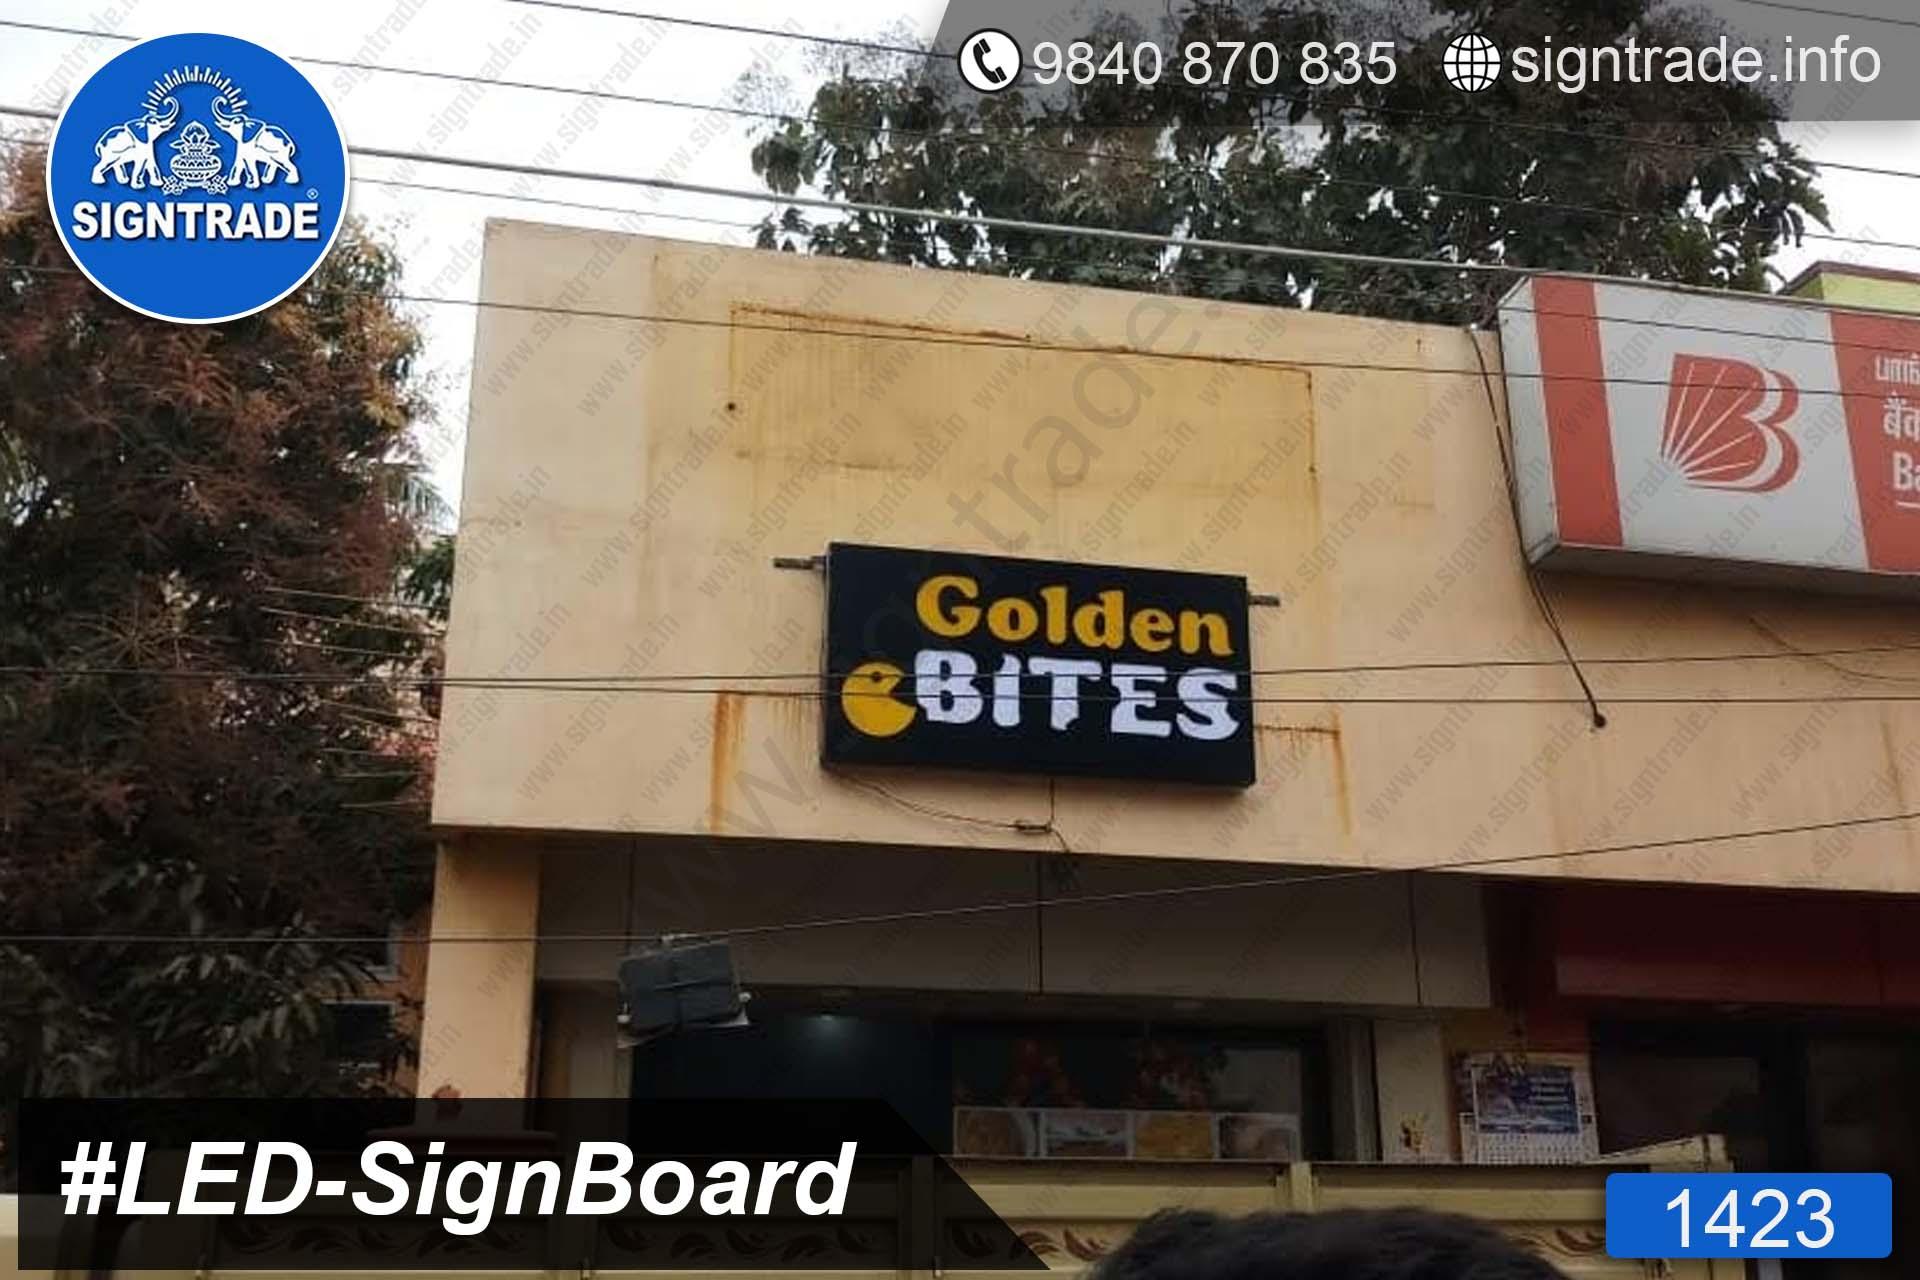 Golden Bites - 1423, LED Sign Board, Sign Board, Acrylic Sign Board, Glow Sign Board, Custom Sign Board